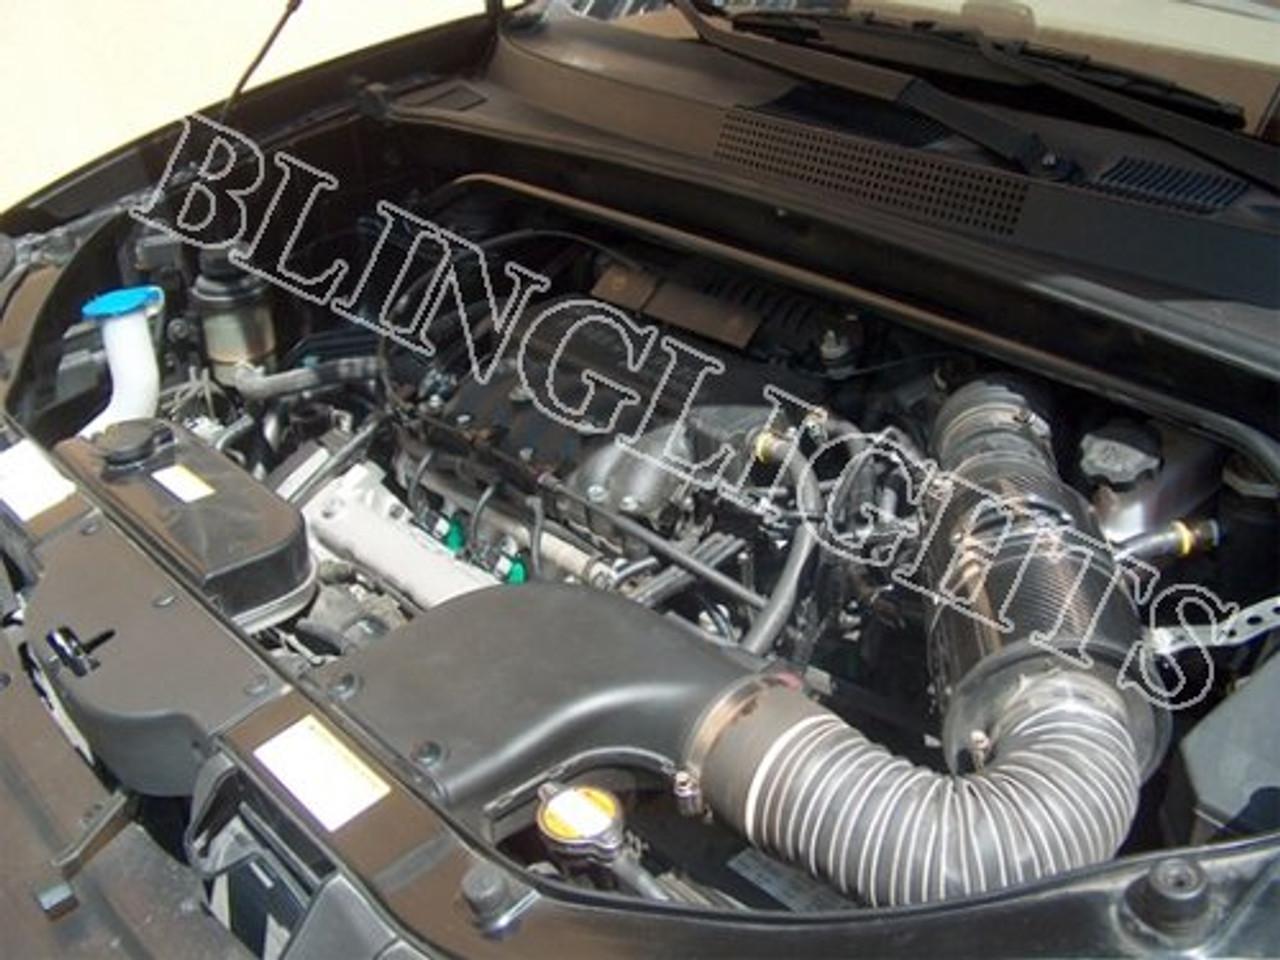 hyundai santa fe 2 7l 2 7 l delta v6 cold air performance engine motor intake cai system blinglights com hyundai santa fe 2 7l 2 7 l delta v6 cold air performance engine motor intake cai system